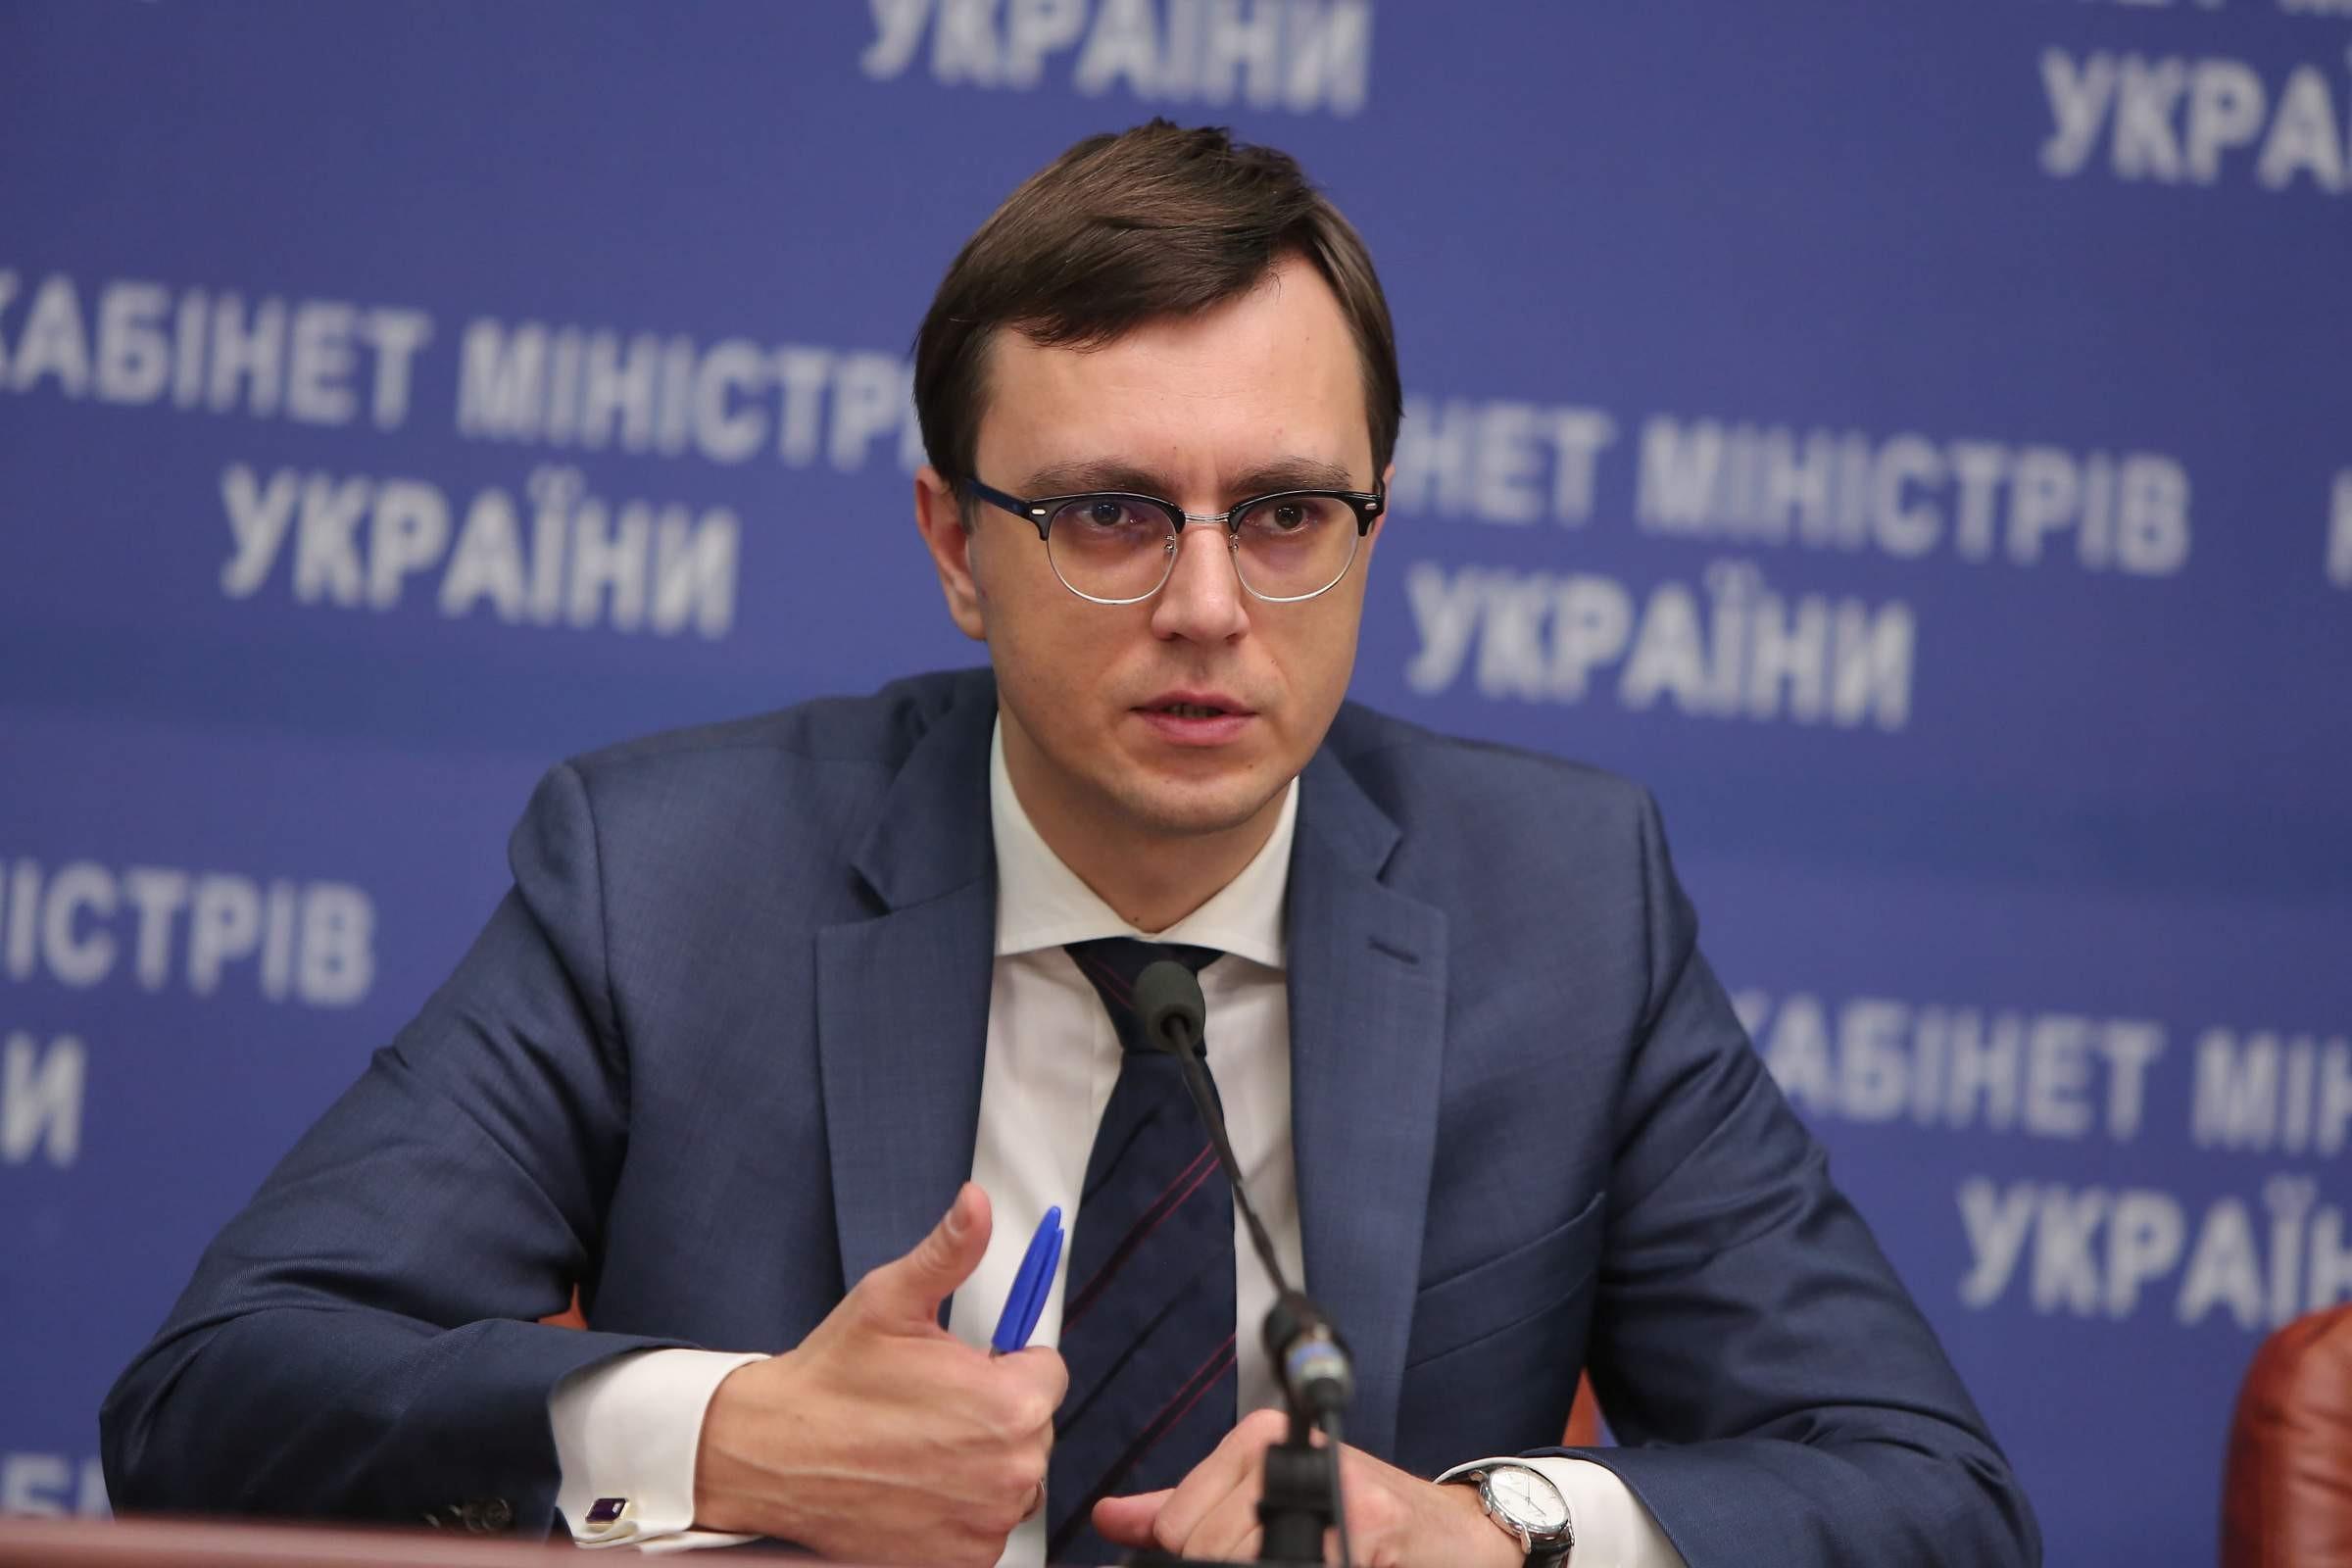 Кабмин одобрил договор сгендиректором «Укрзализныци» Войцехом Балчуном